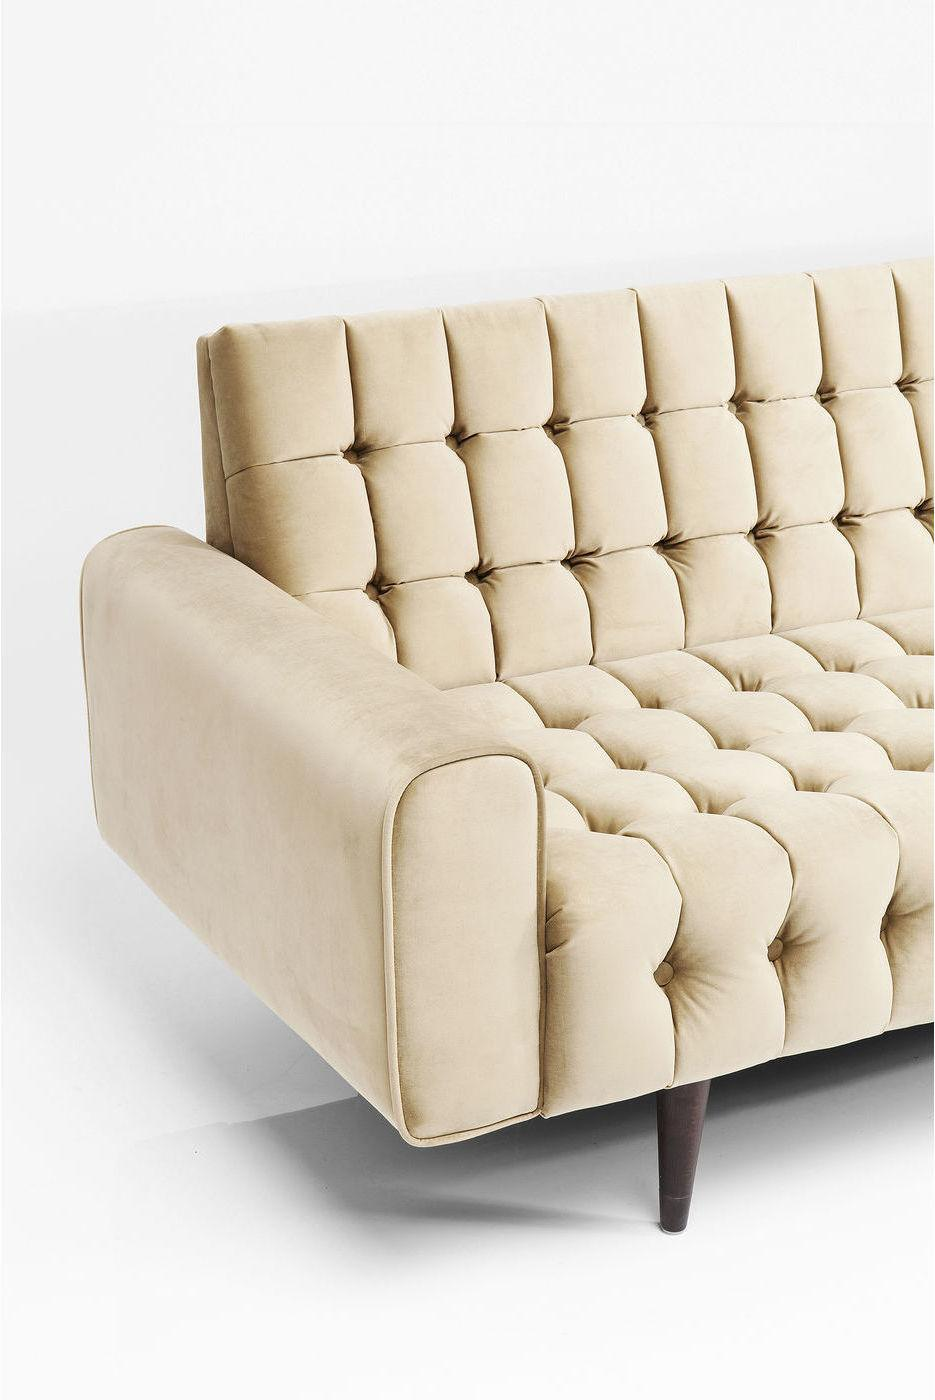 Kare Design Milchbar Goldy 3-Zits Bank - B233 Cm - Goud Fluweel